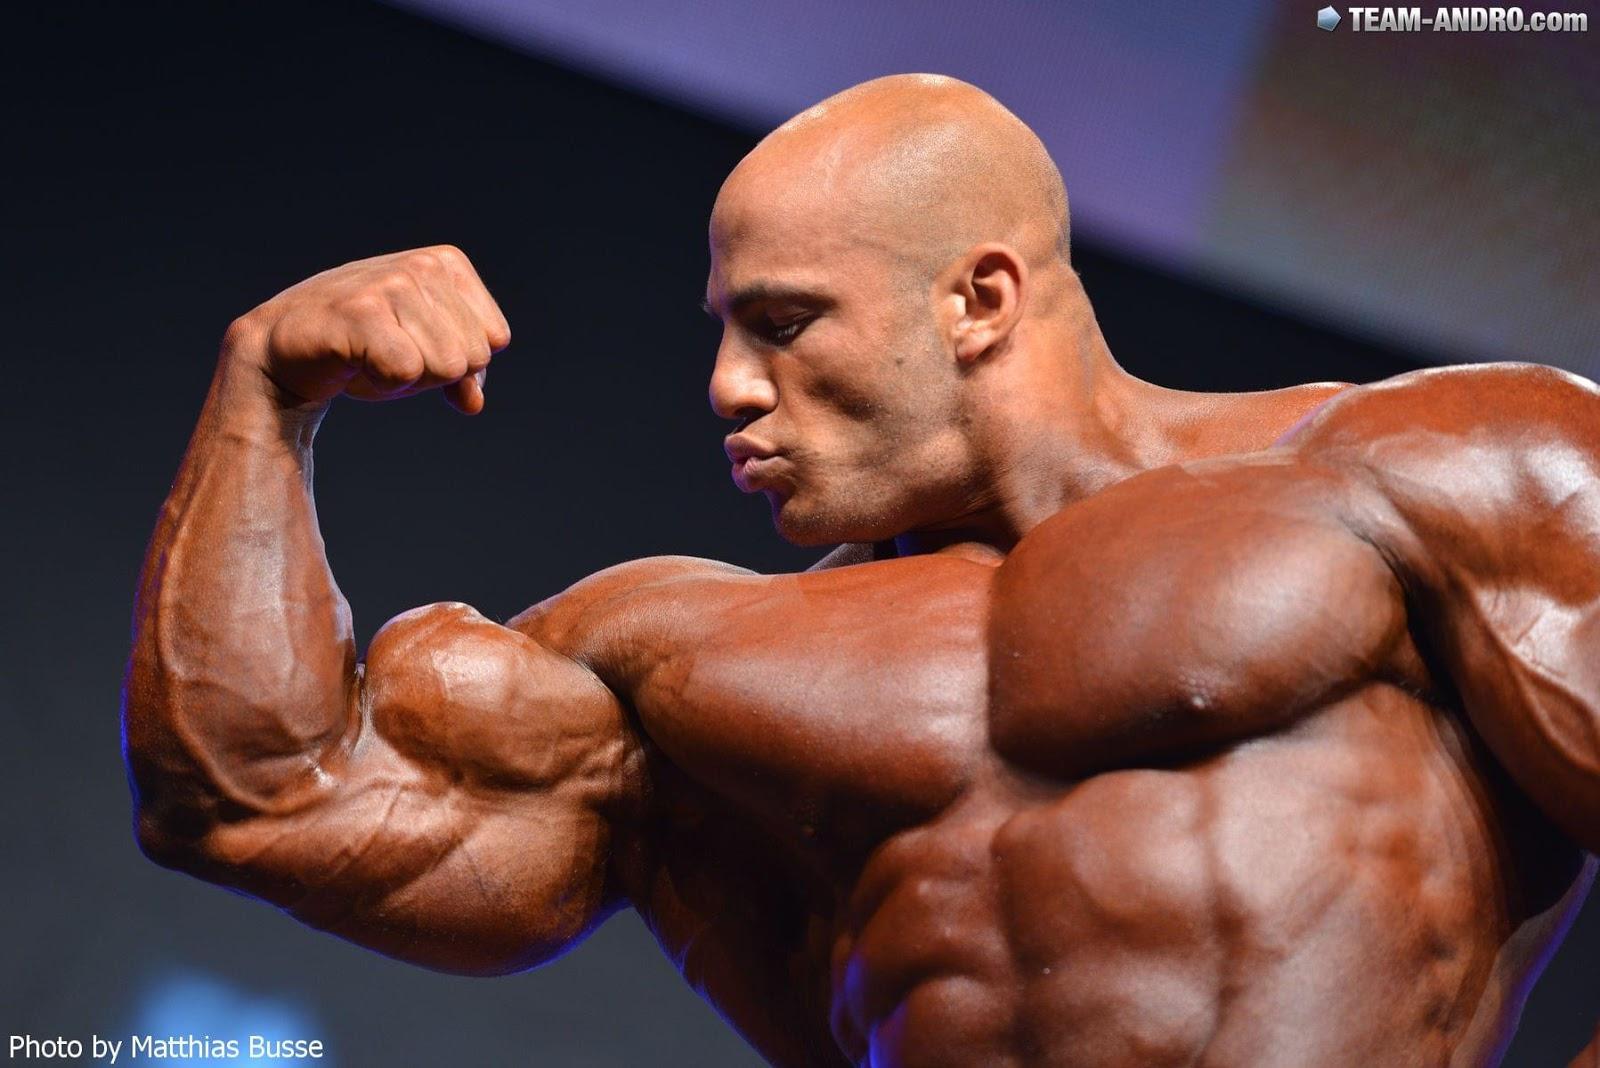 Muscle Lover Ifbb Pro Mamdouh Big Ramy Elssbiay Part 3